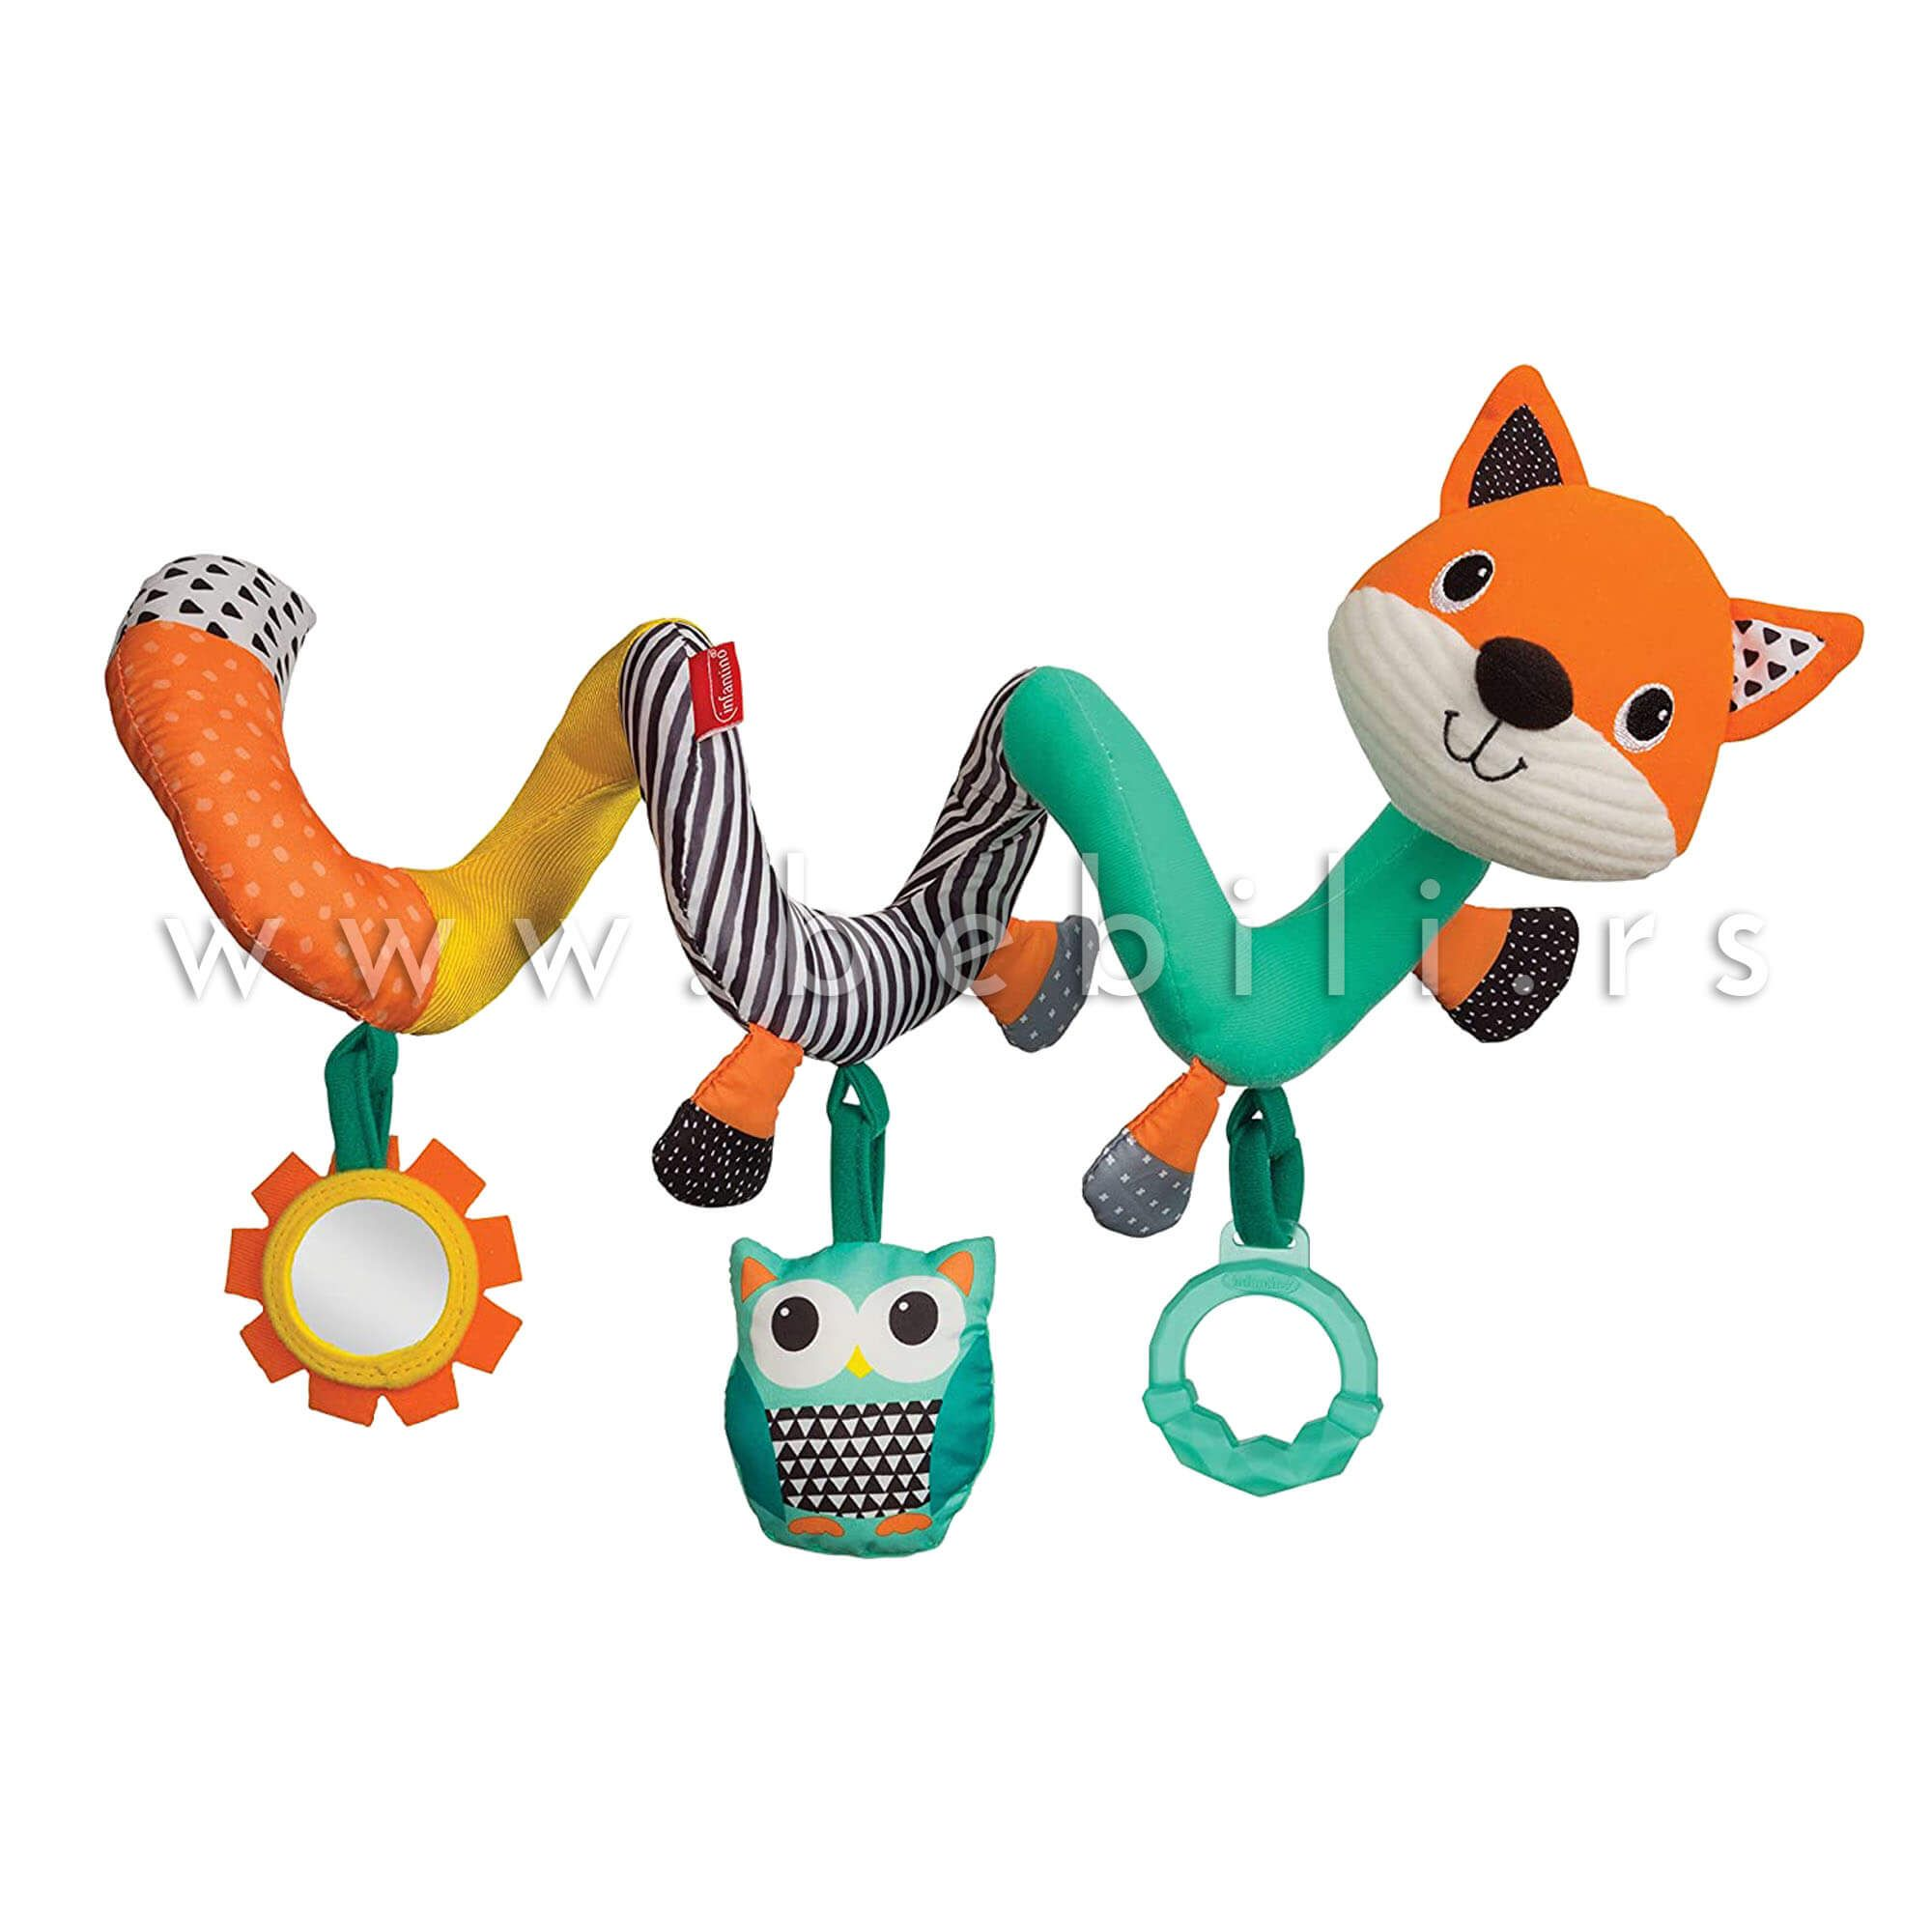 Infantino Igracka Za Kolica Lisica In 2020 Activity Toys Unique Toys Manhattan Toy